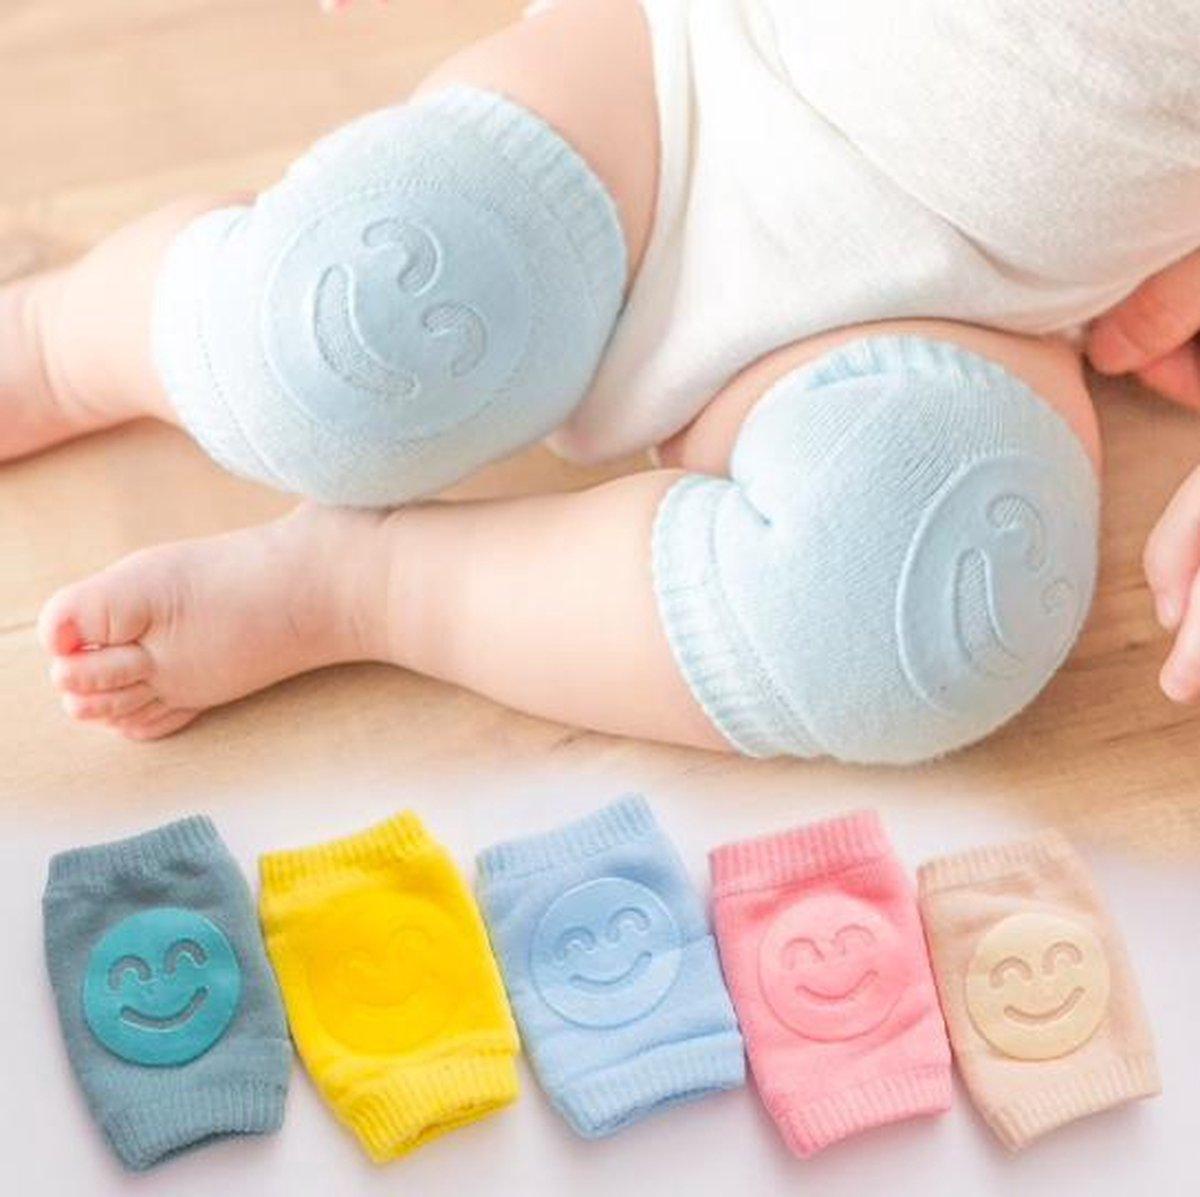 Baby Anti Slip Knie Kussen - Bescherming van de Knie - Gevoeligheid Baby - Zachte Rekbare Stof